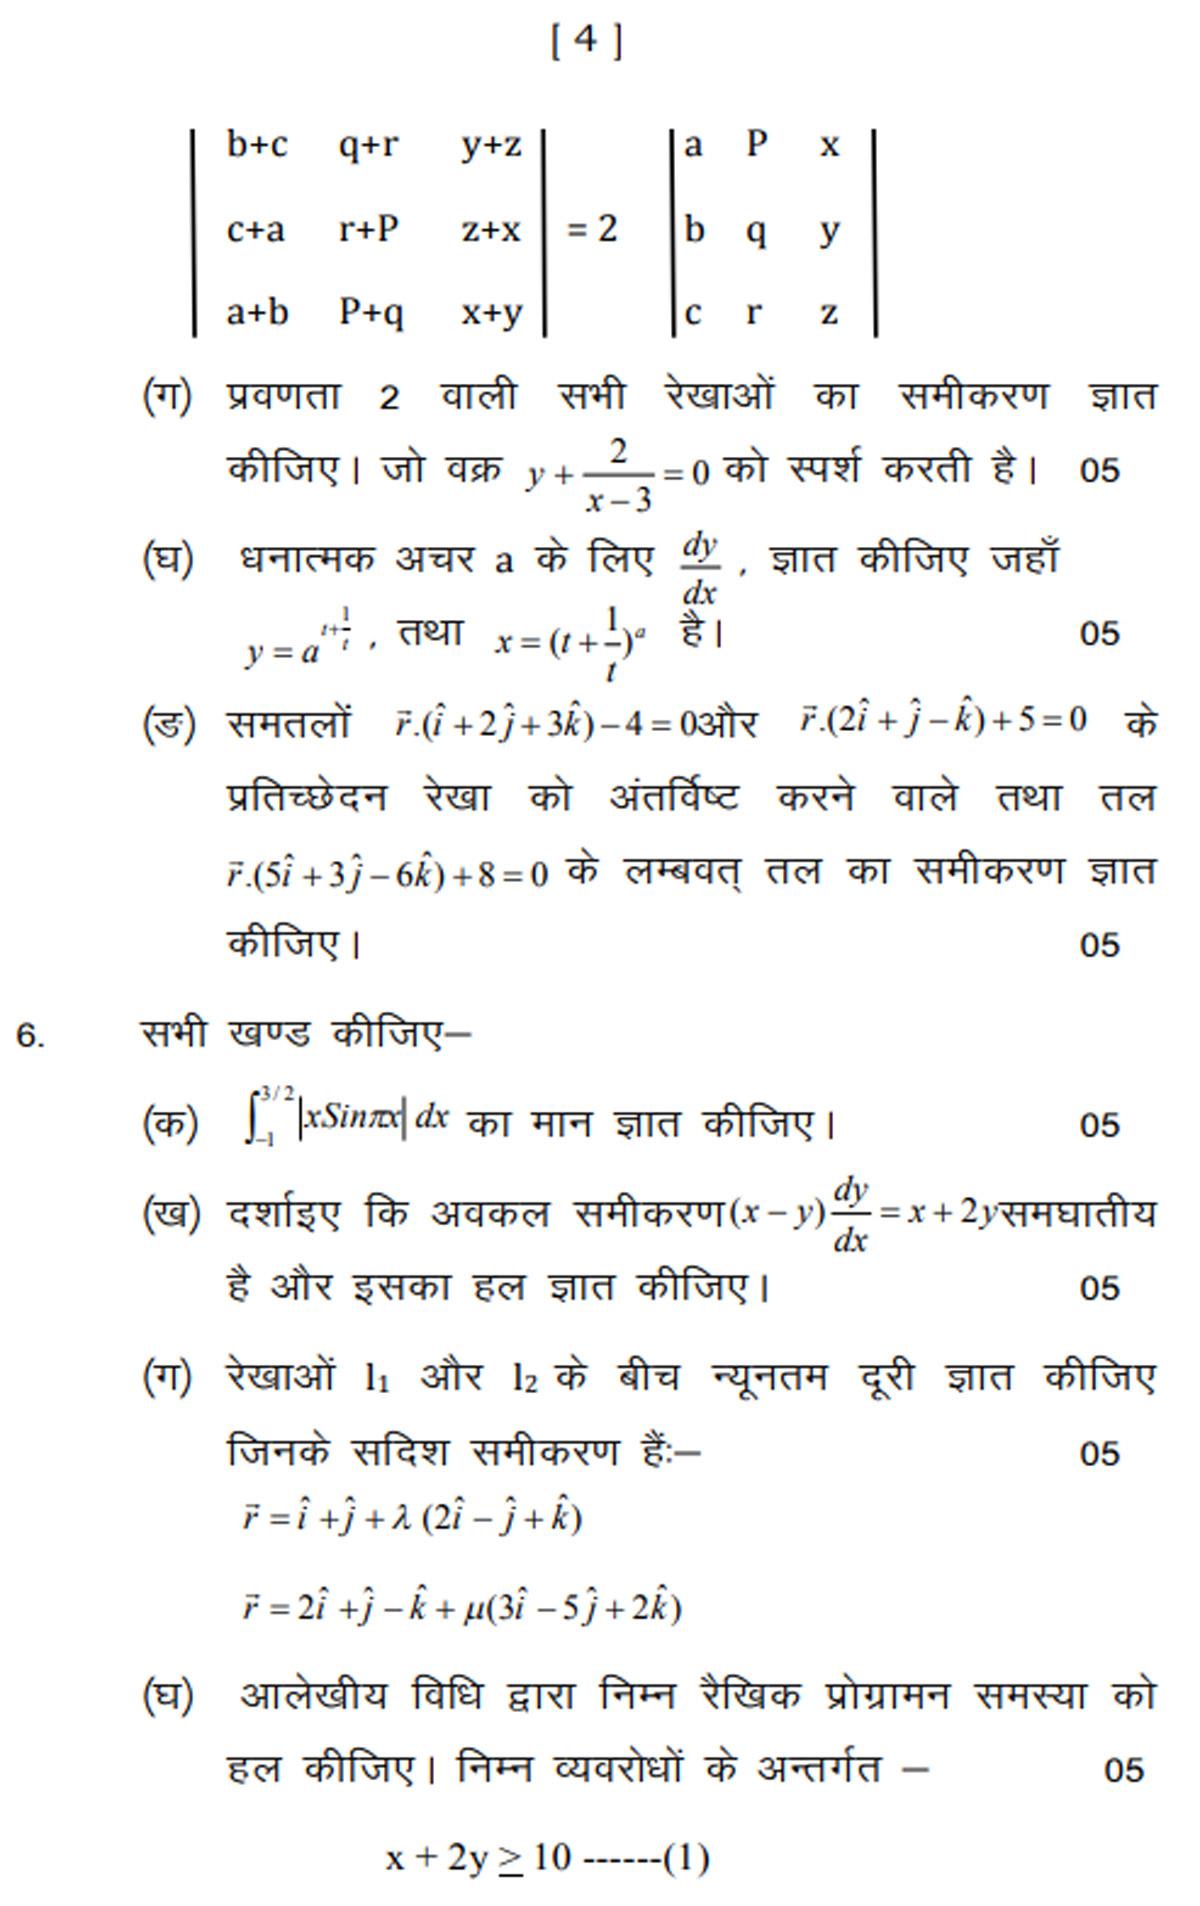 4. UP Board Class 12th Maths Model Test Paper